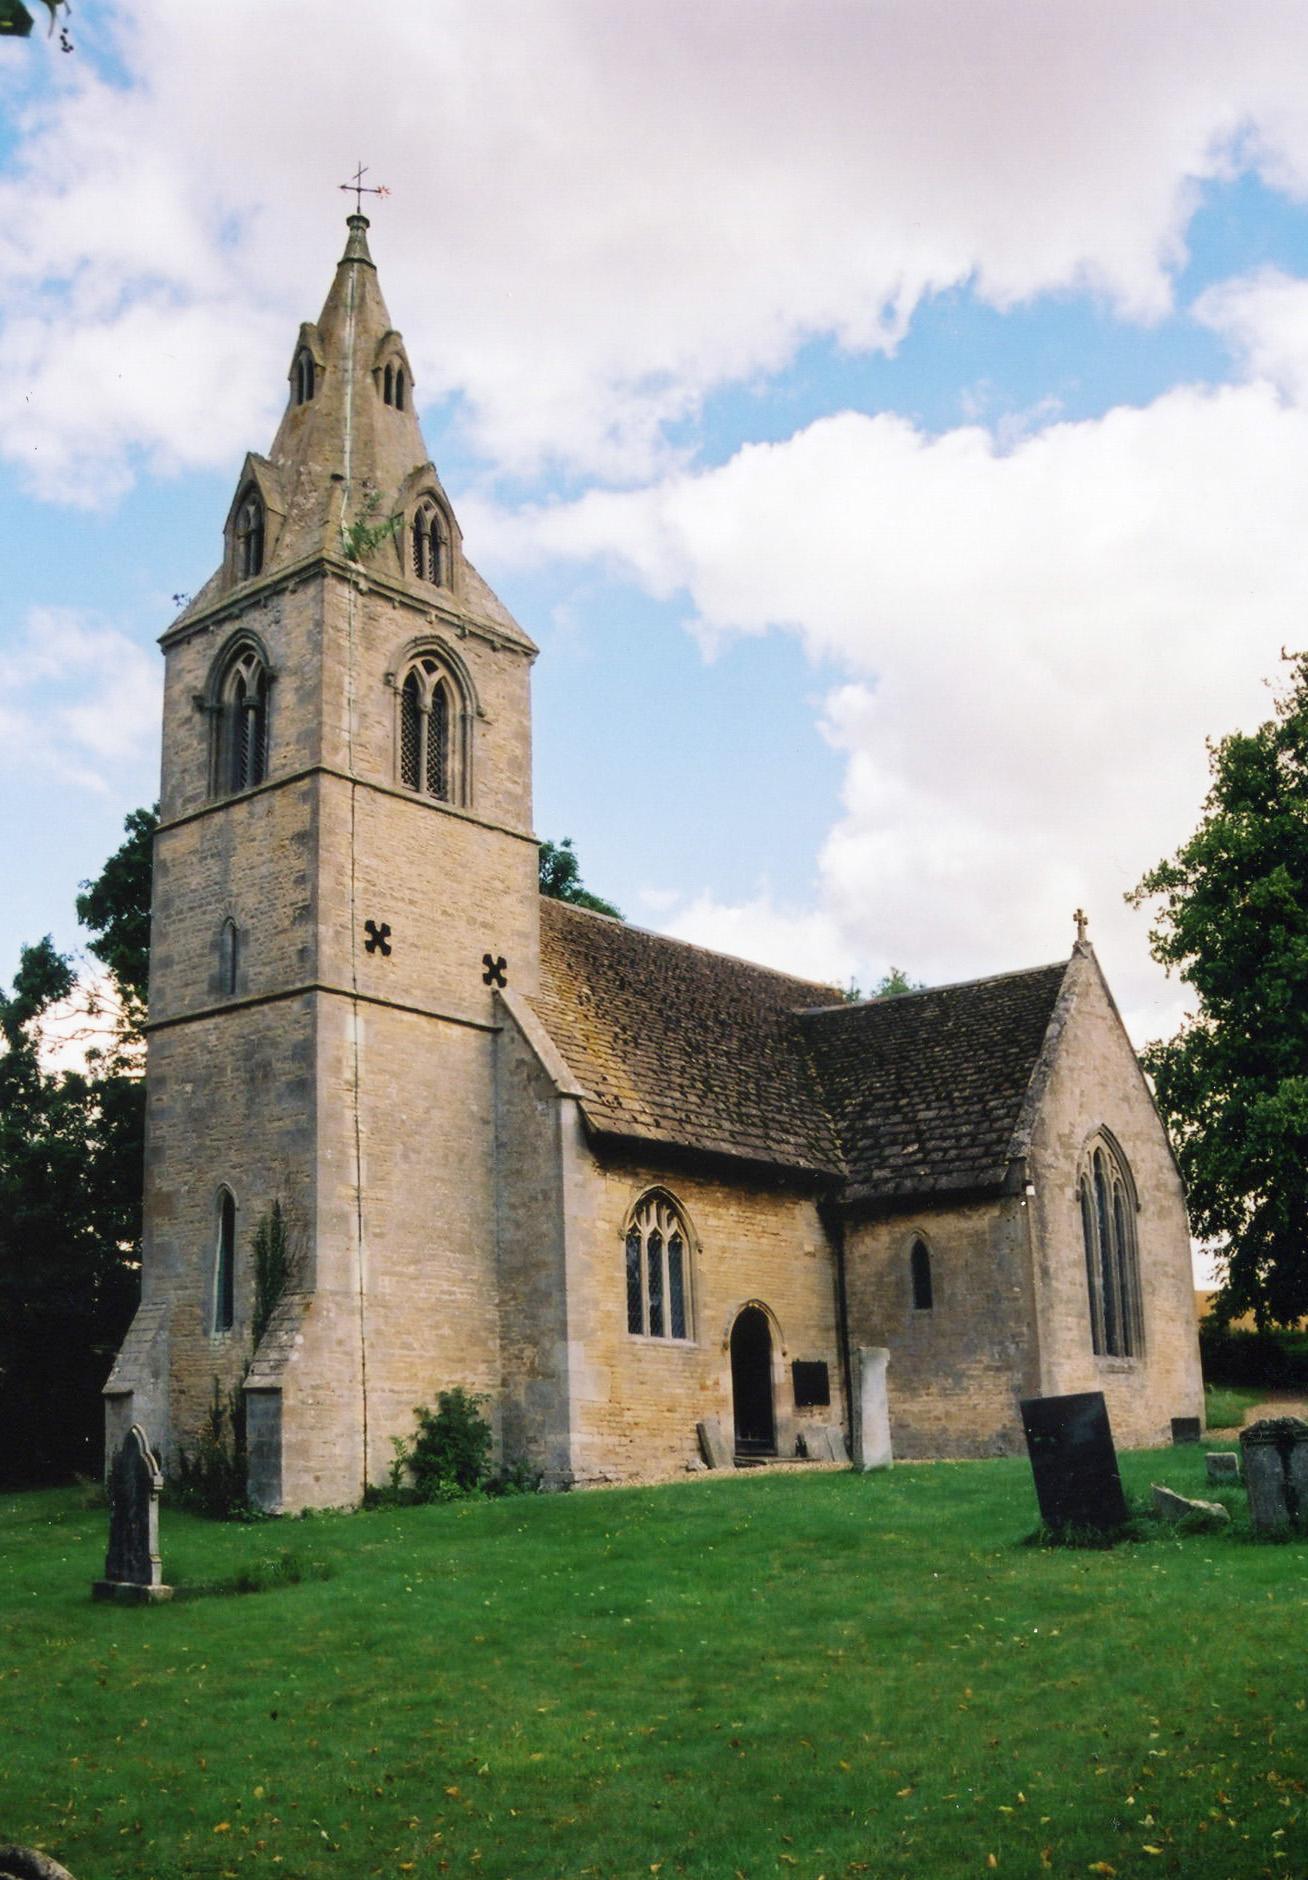 Creeton St. Peter Church